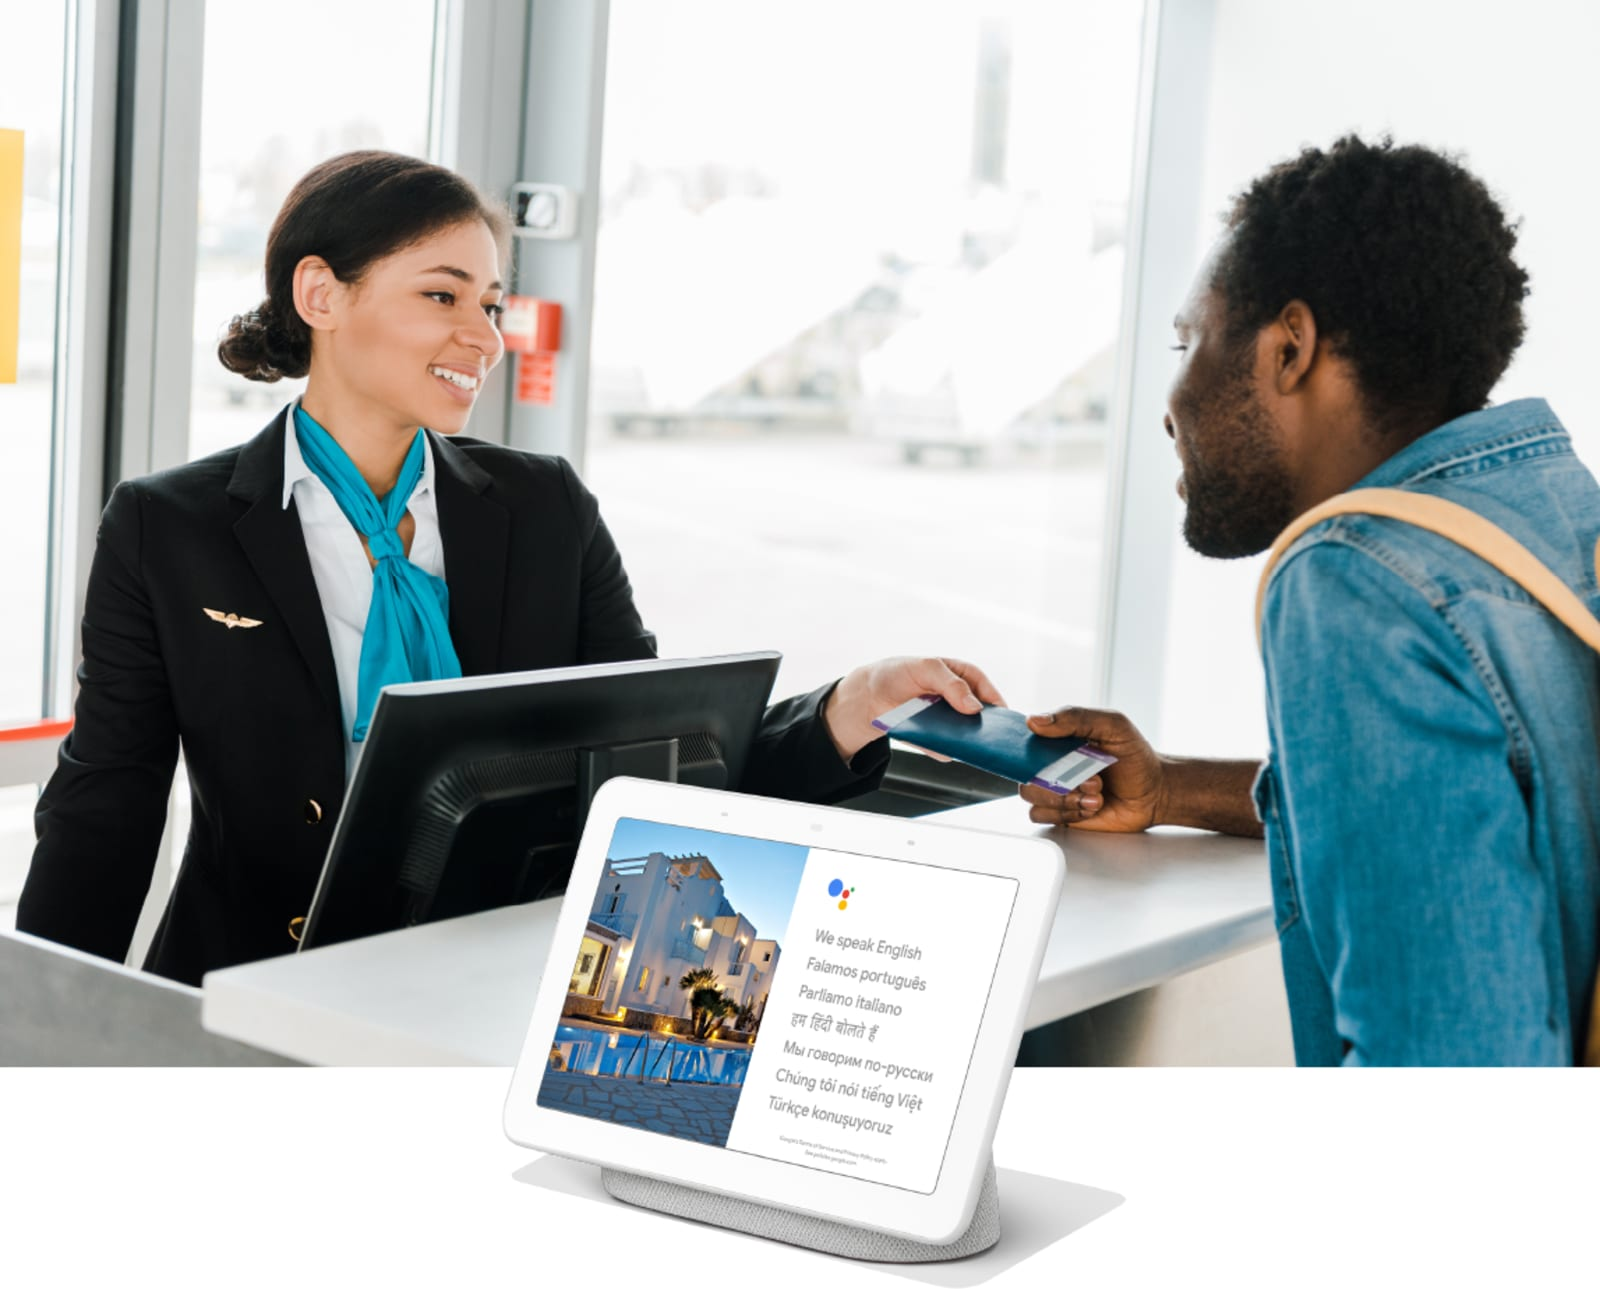 Google Assistant Interpreter Mode at airports